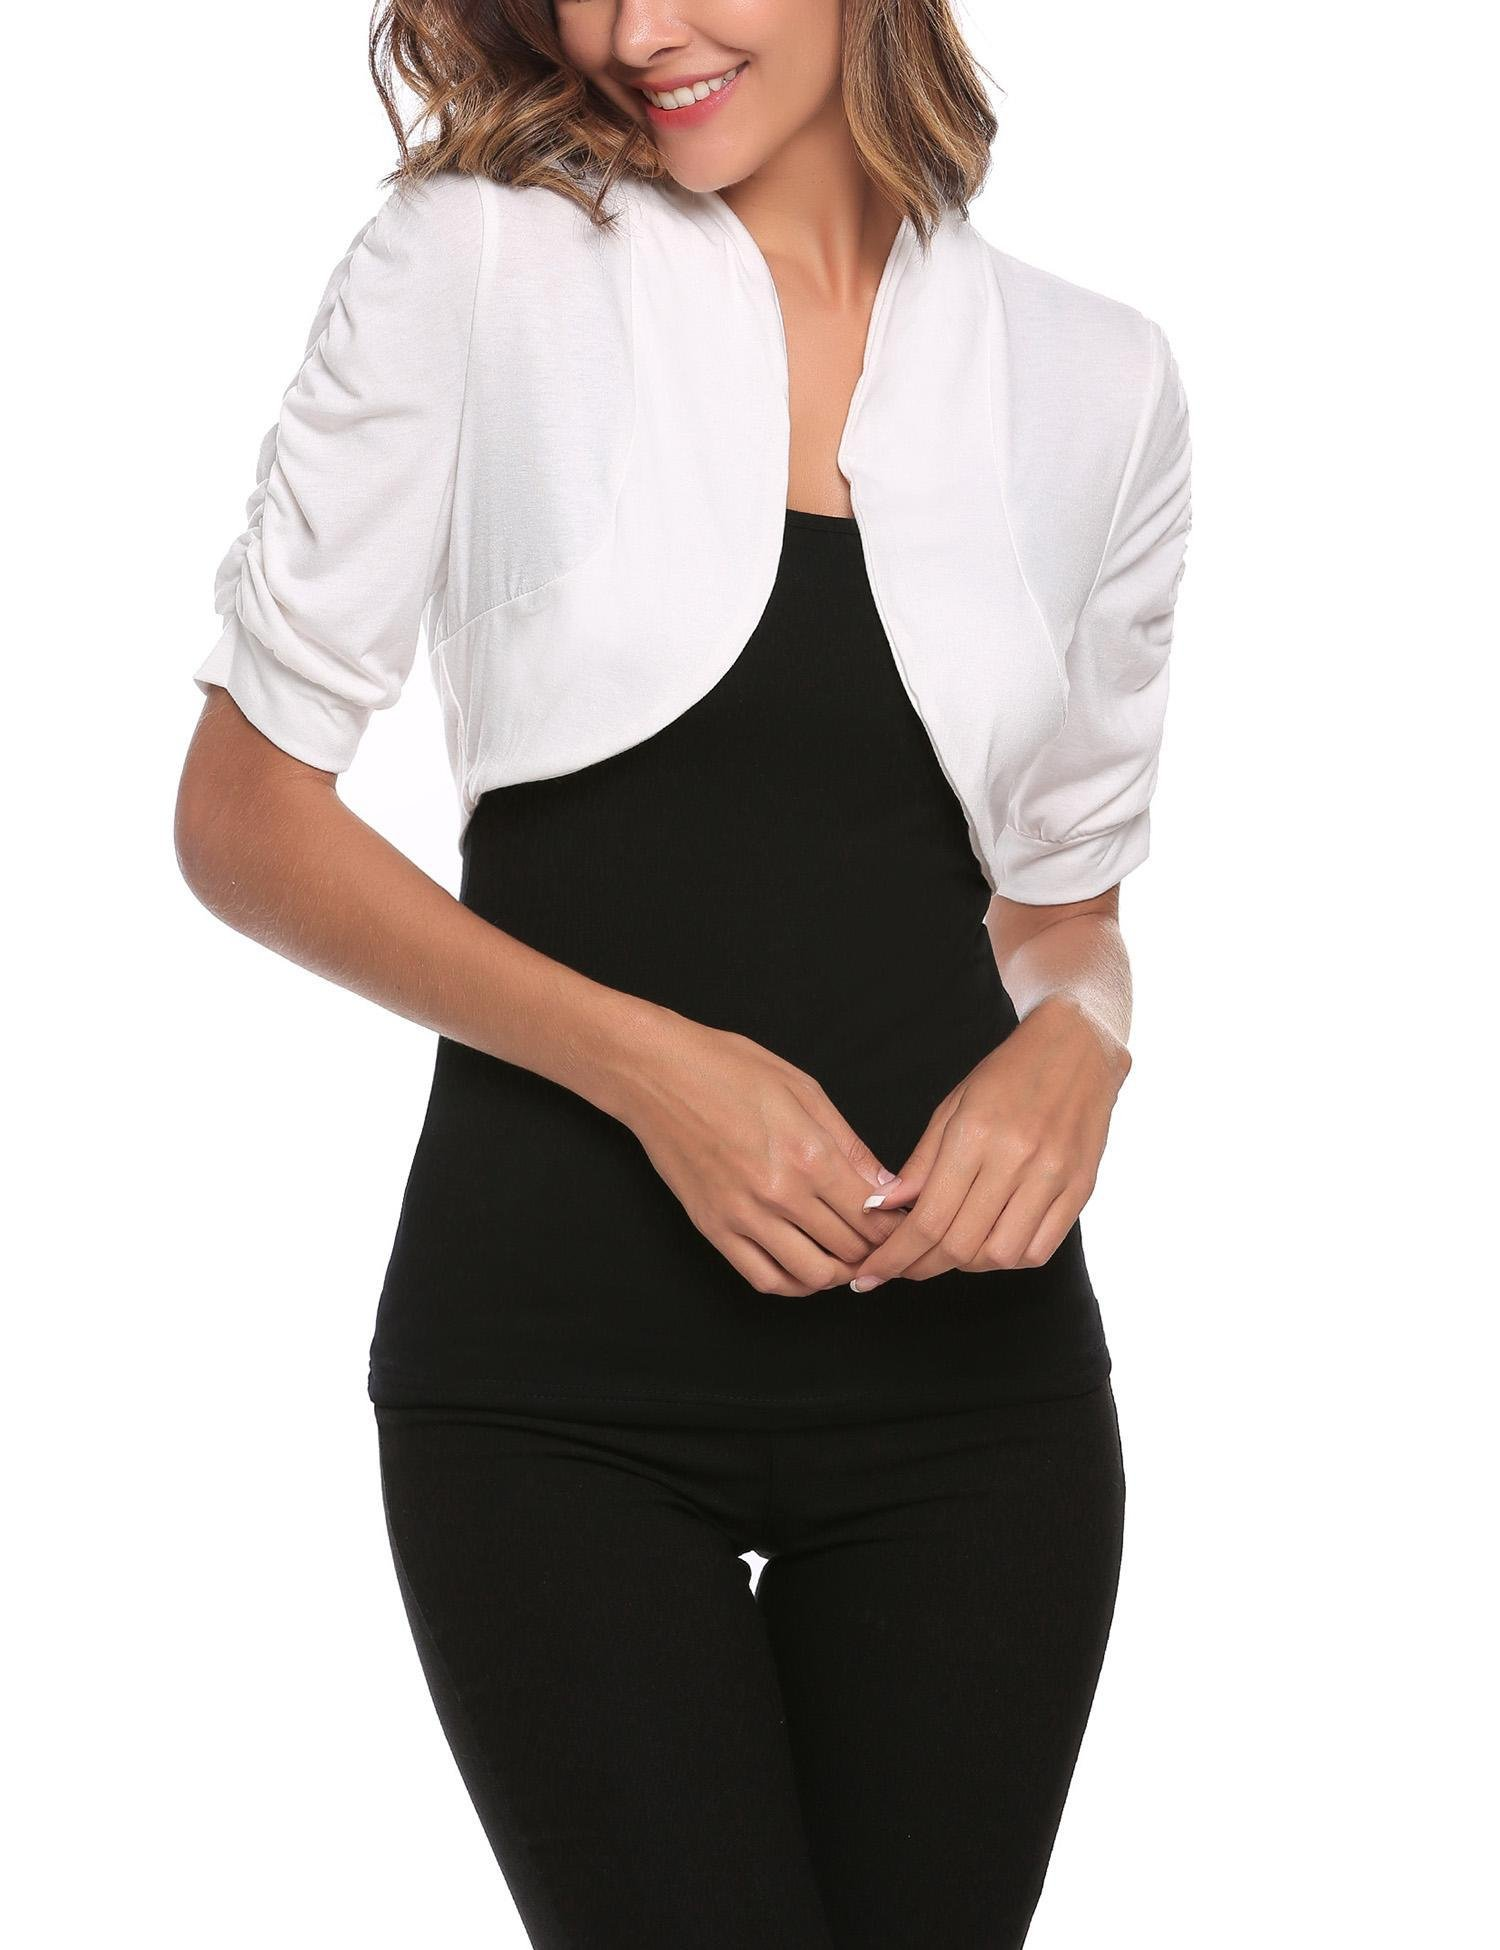 Elesol Women Summer Beach Casual Bolero Shrug Floral Lace Classic 3/4 Sleeve Tops White/XL